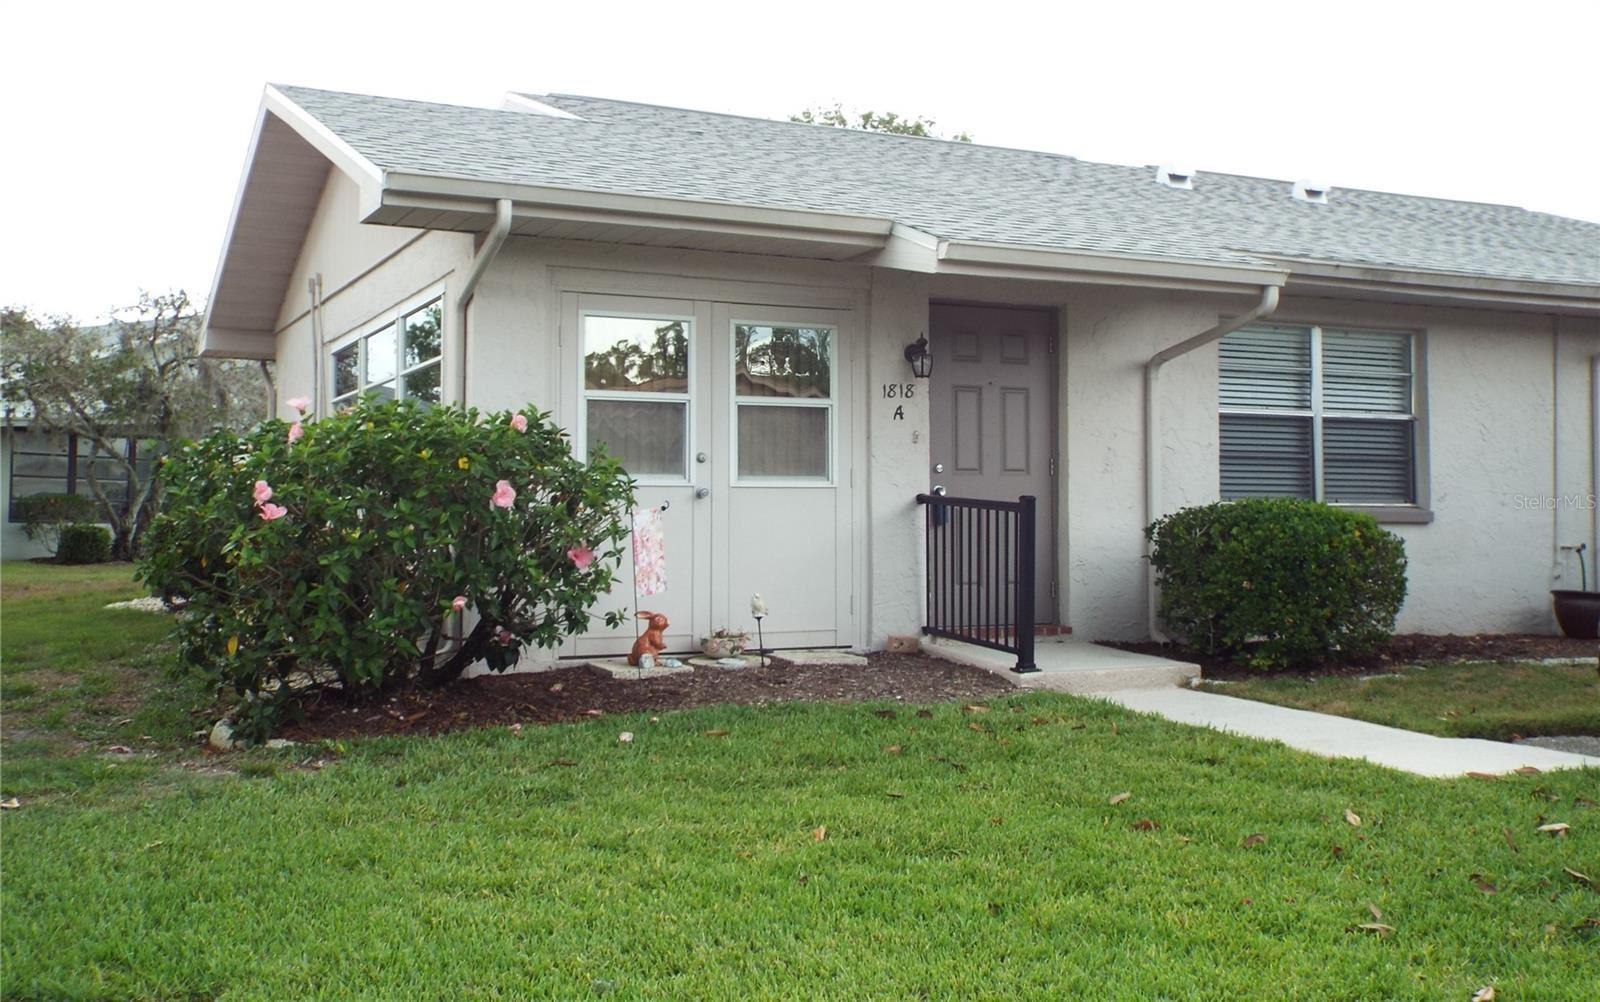 1818 FOXHUNT DRIVE #A, Sun City Center, FL 33573 - #: T3310945